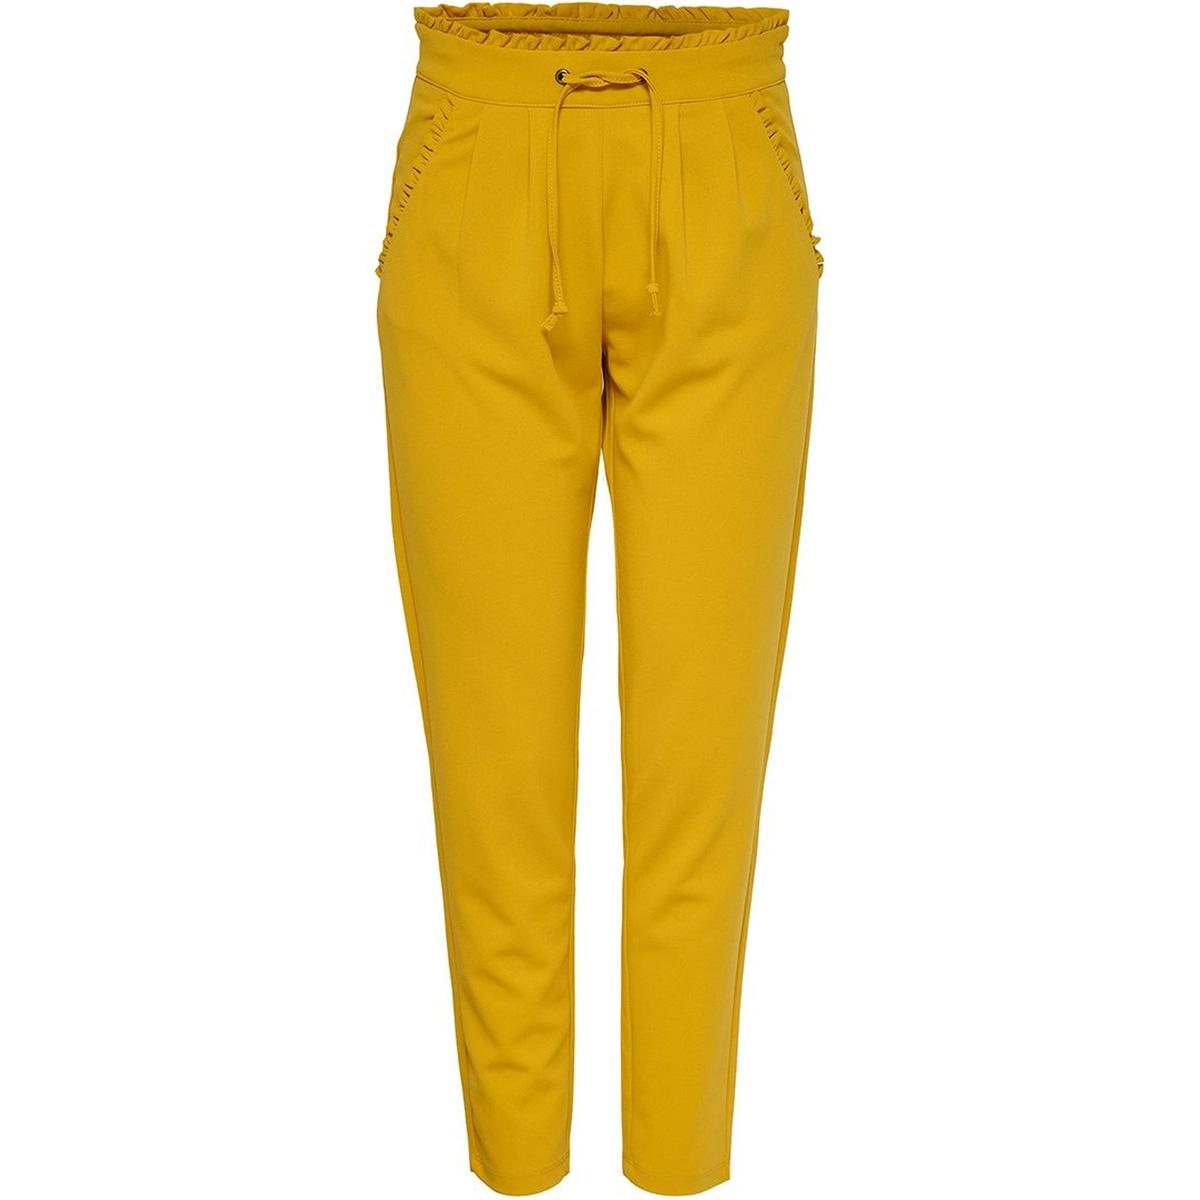 jdycatia pants jrs noos 15152796 jacqueline de yong broek harvest gold